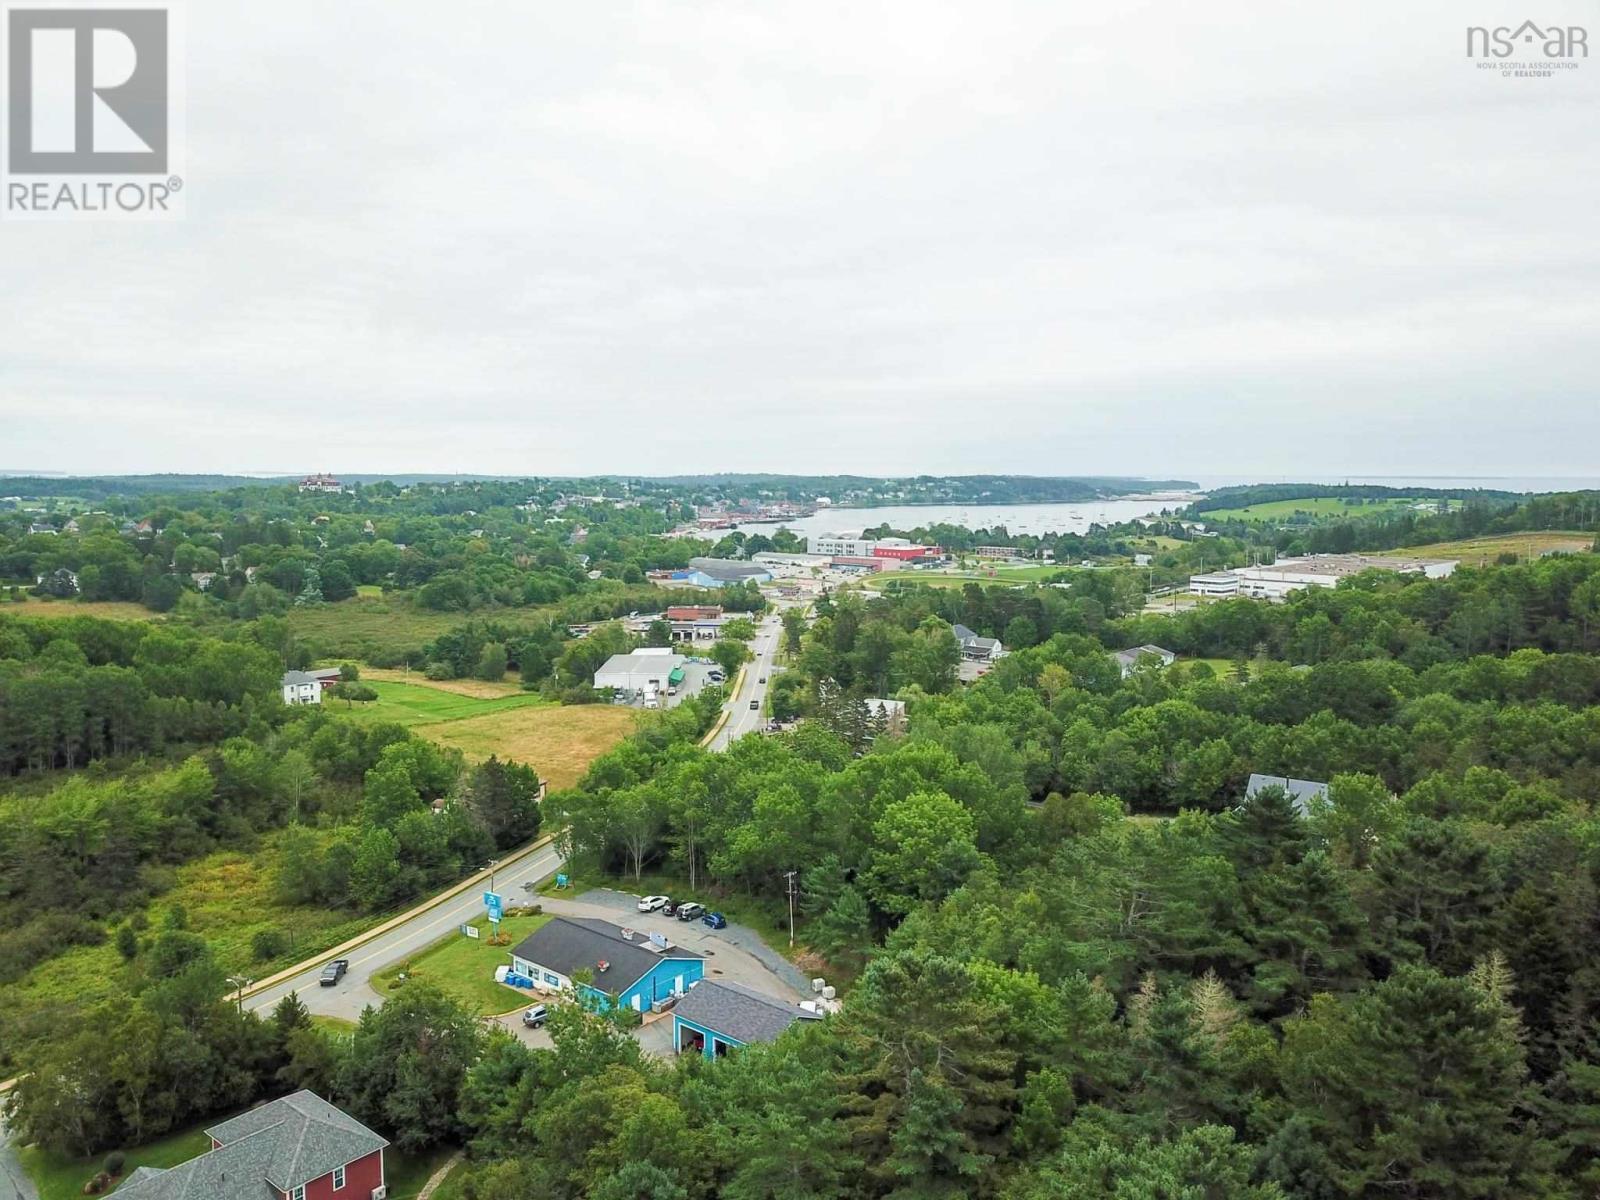 Lot 29 Hebb Street, Lunenburg, Nova Scotia  B0J 2C0 - Photo 3 - 202120490